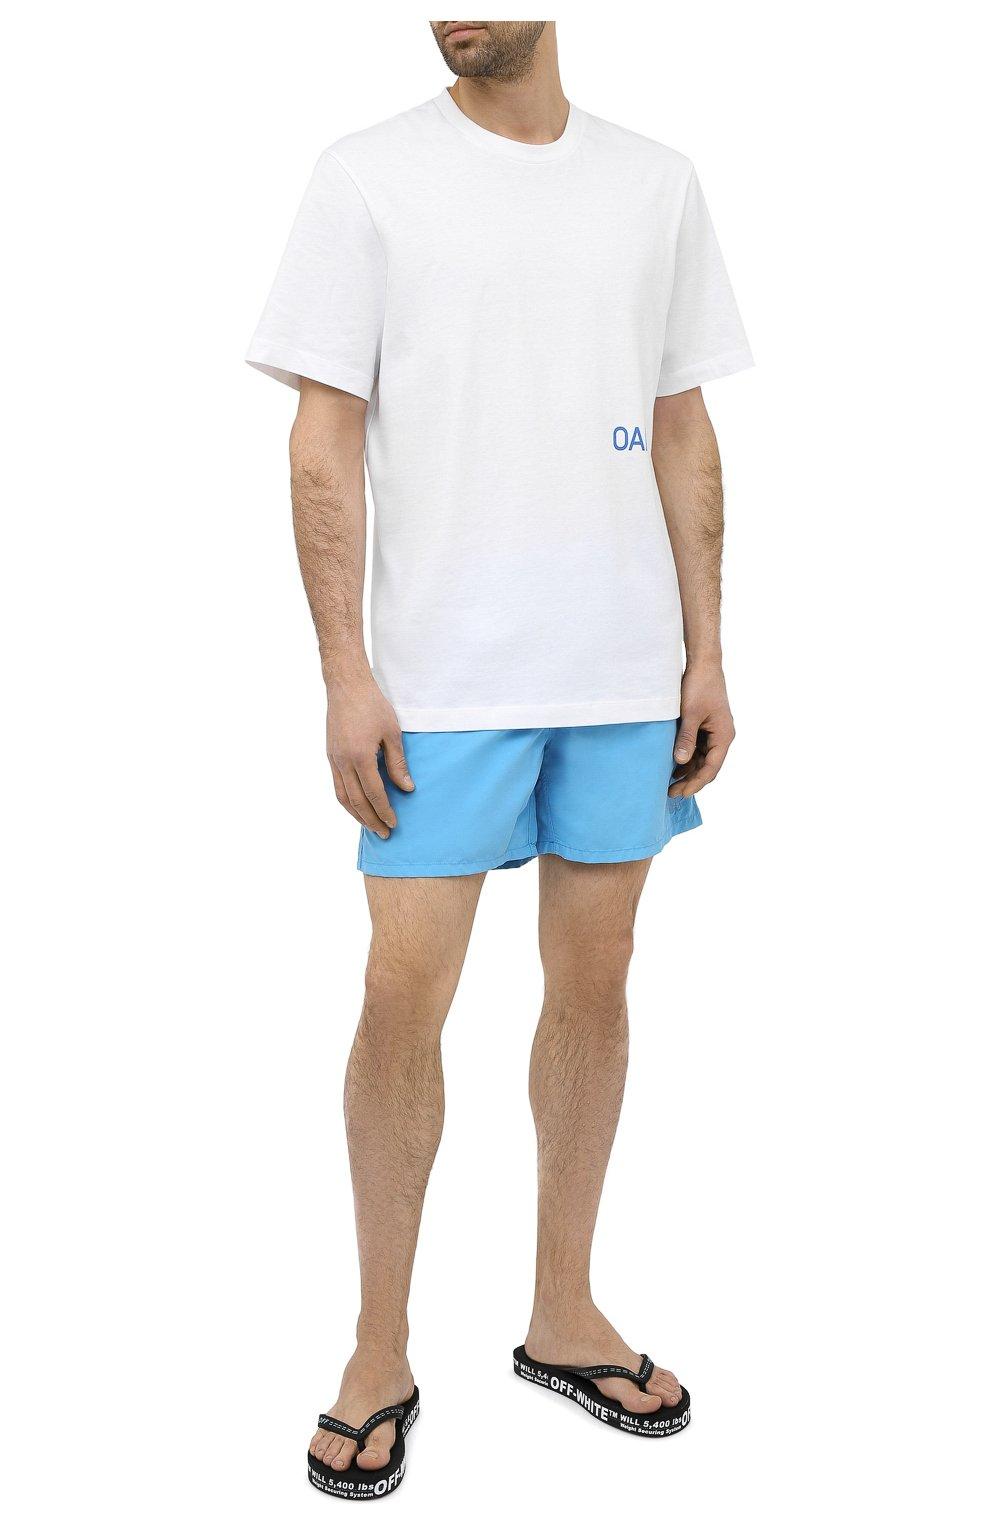 Мужские шлепанцы OFF-WHITE черного цвета, арт. 0MIC002R21MAT0011001 | Фото 2 (Материал внешний: Резина)